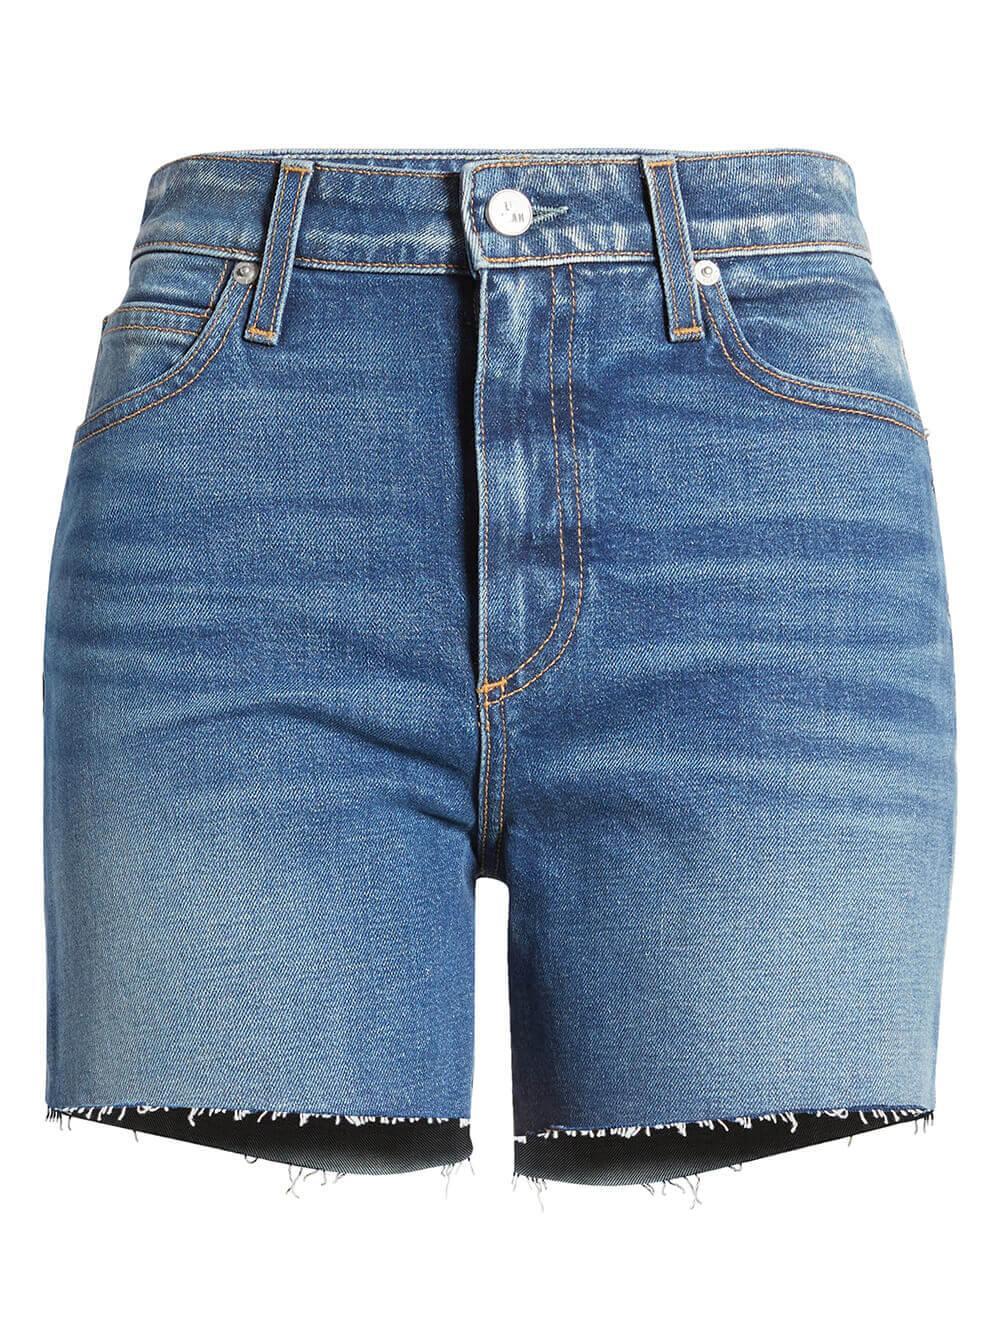 High Rise Lexi Jean Shorts Item # W013-500-336